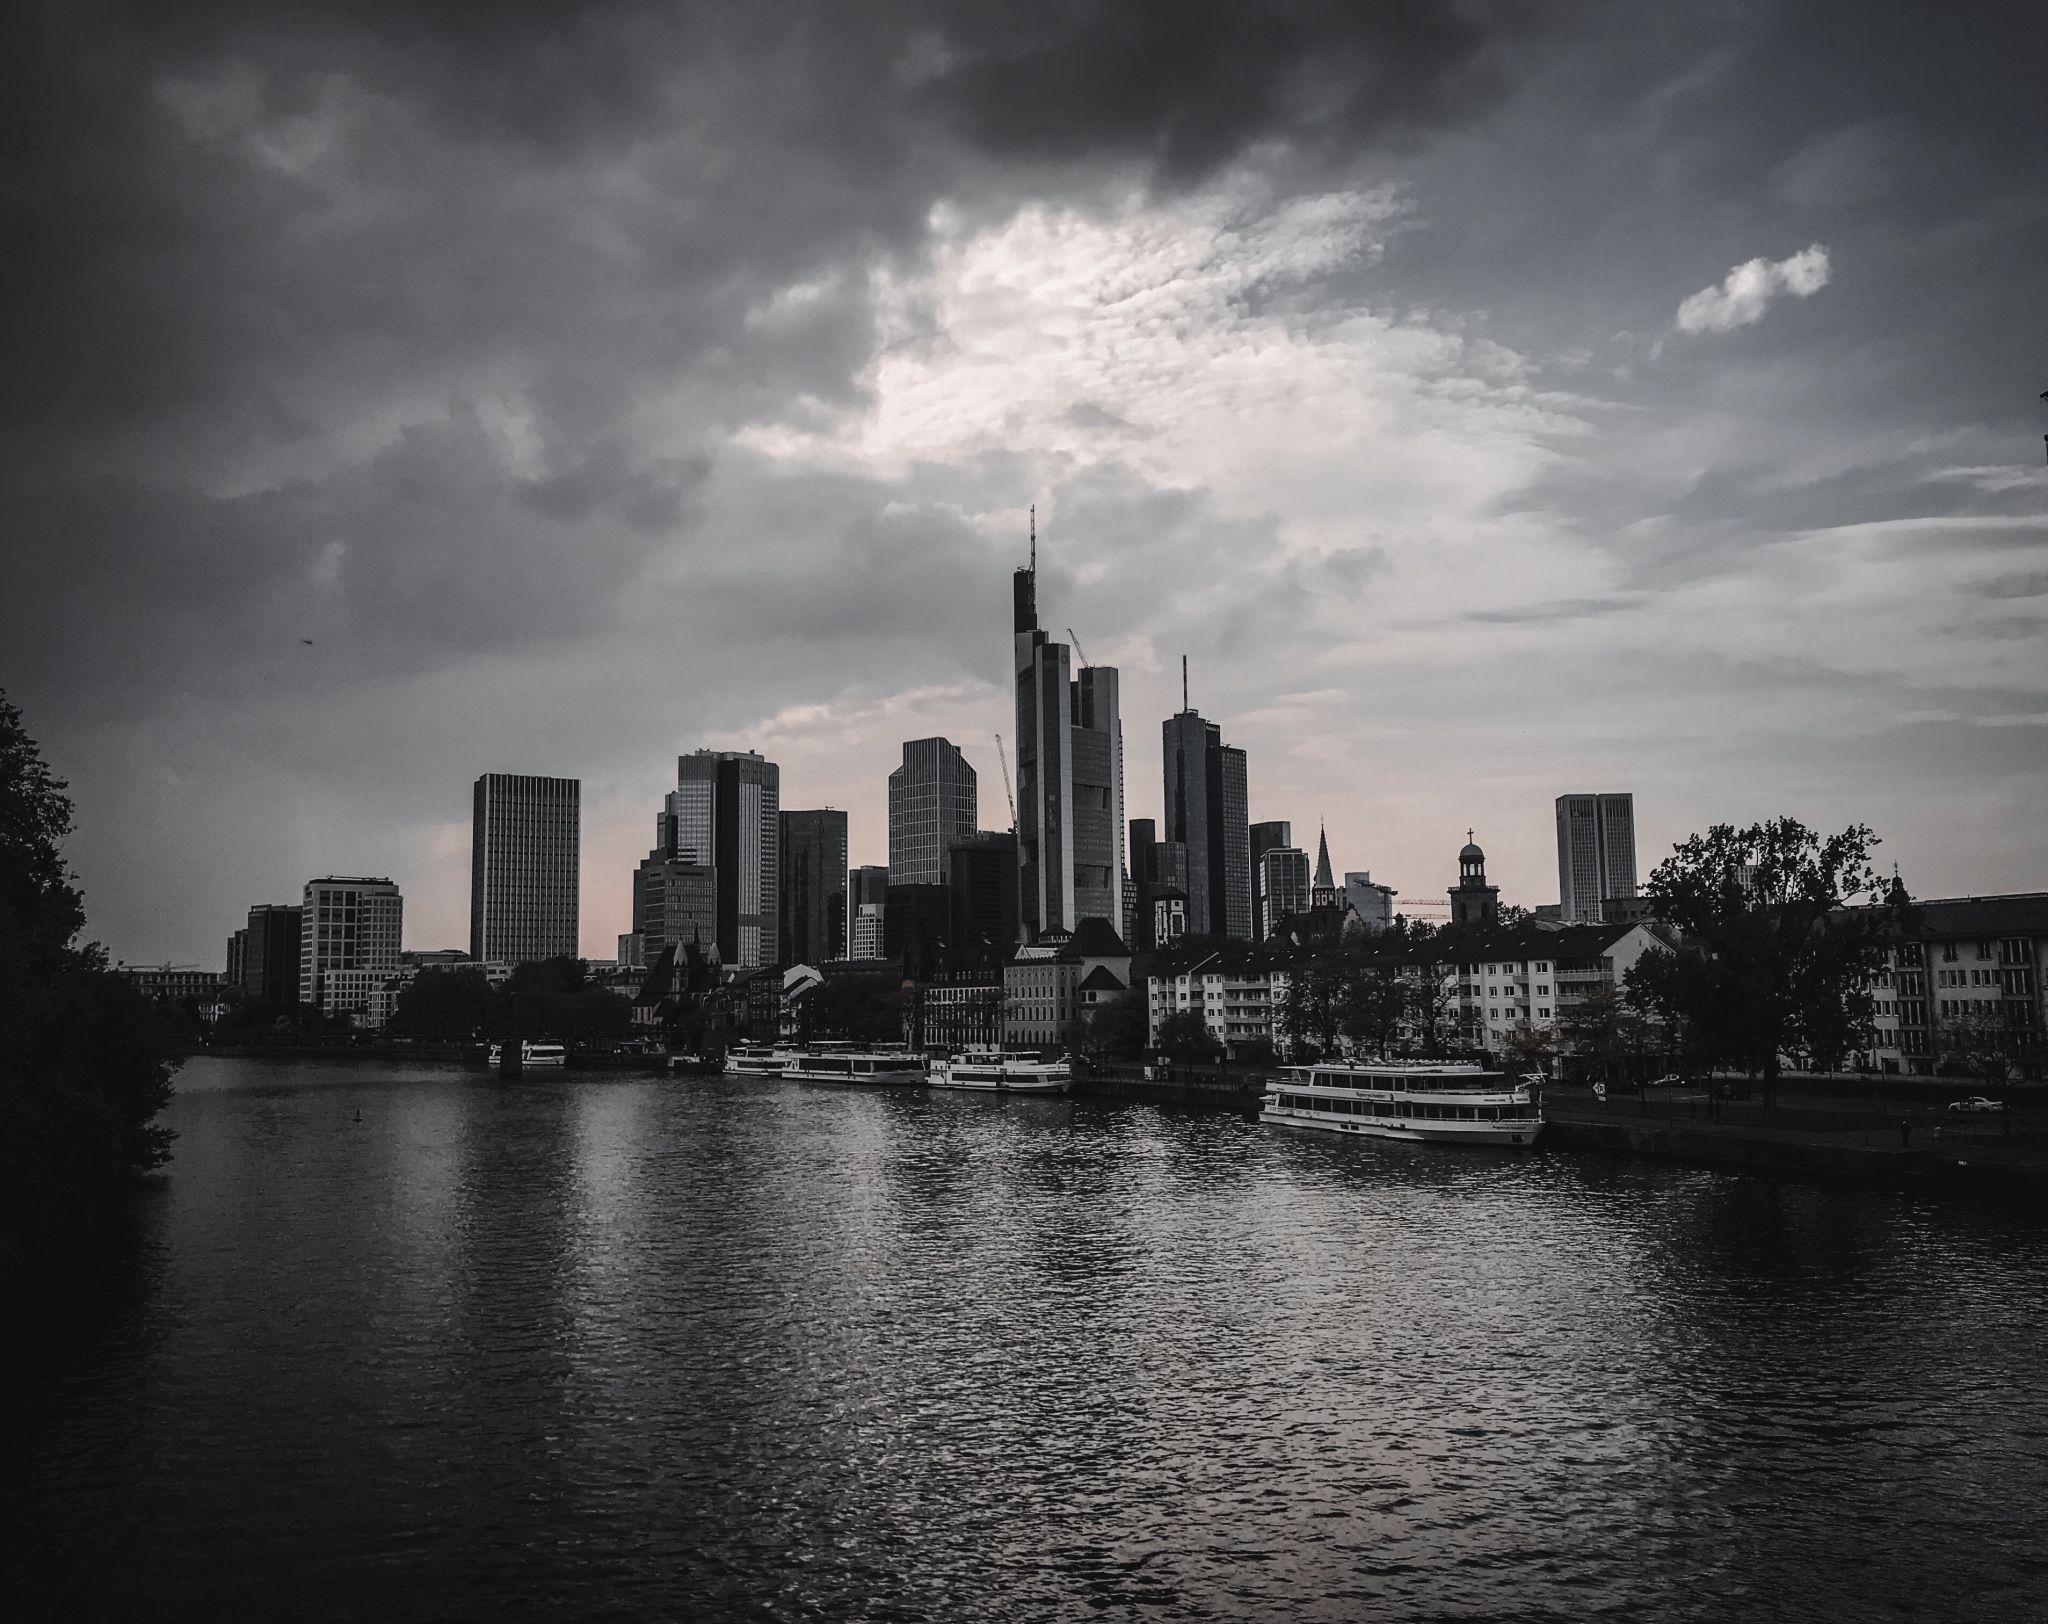 Frankfurt Skyline from Untermainbrücke, Germany